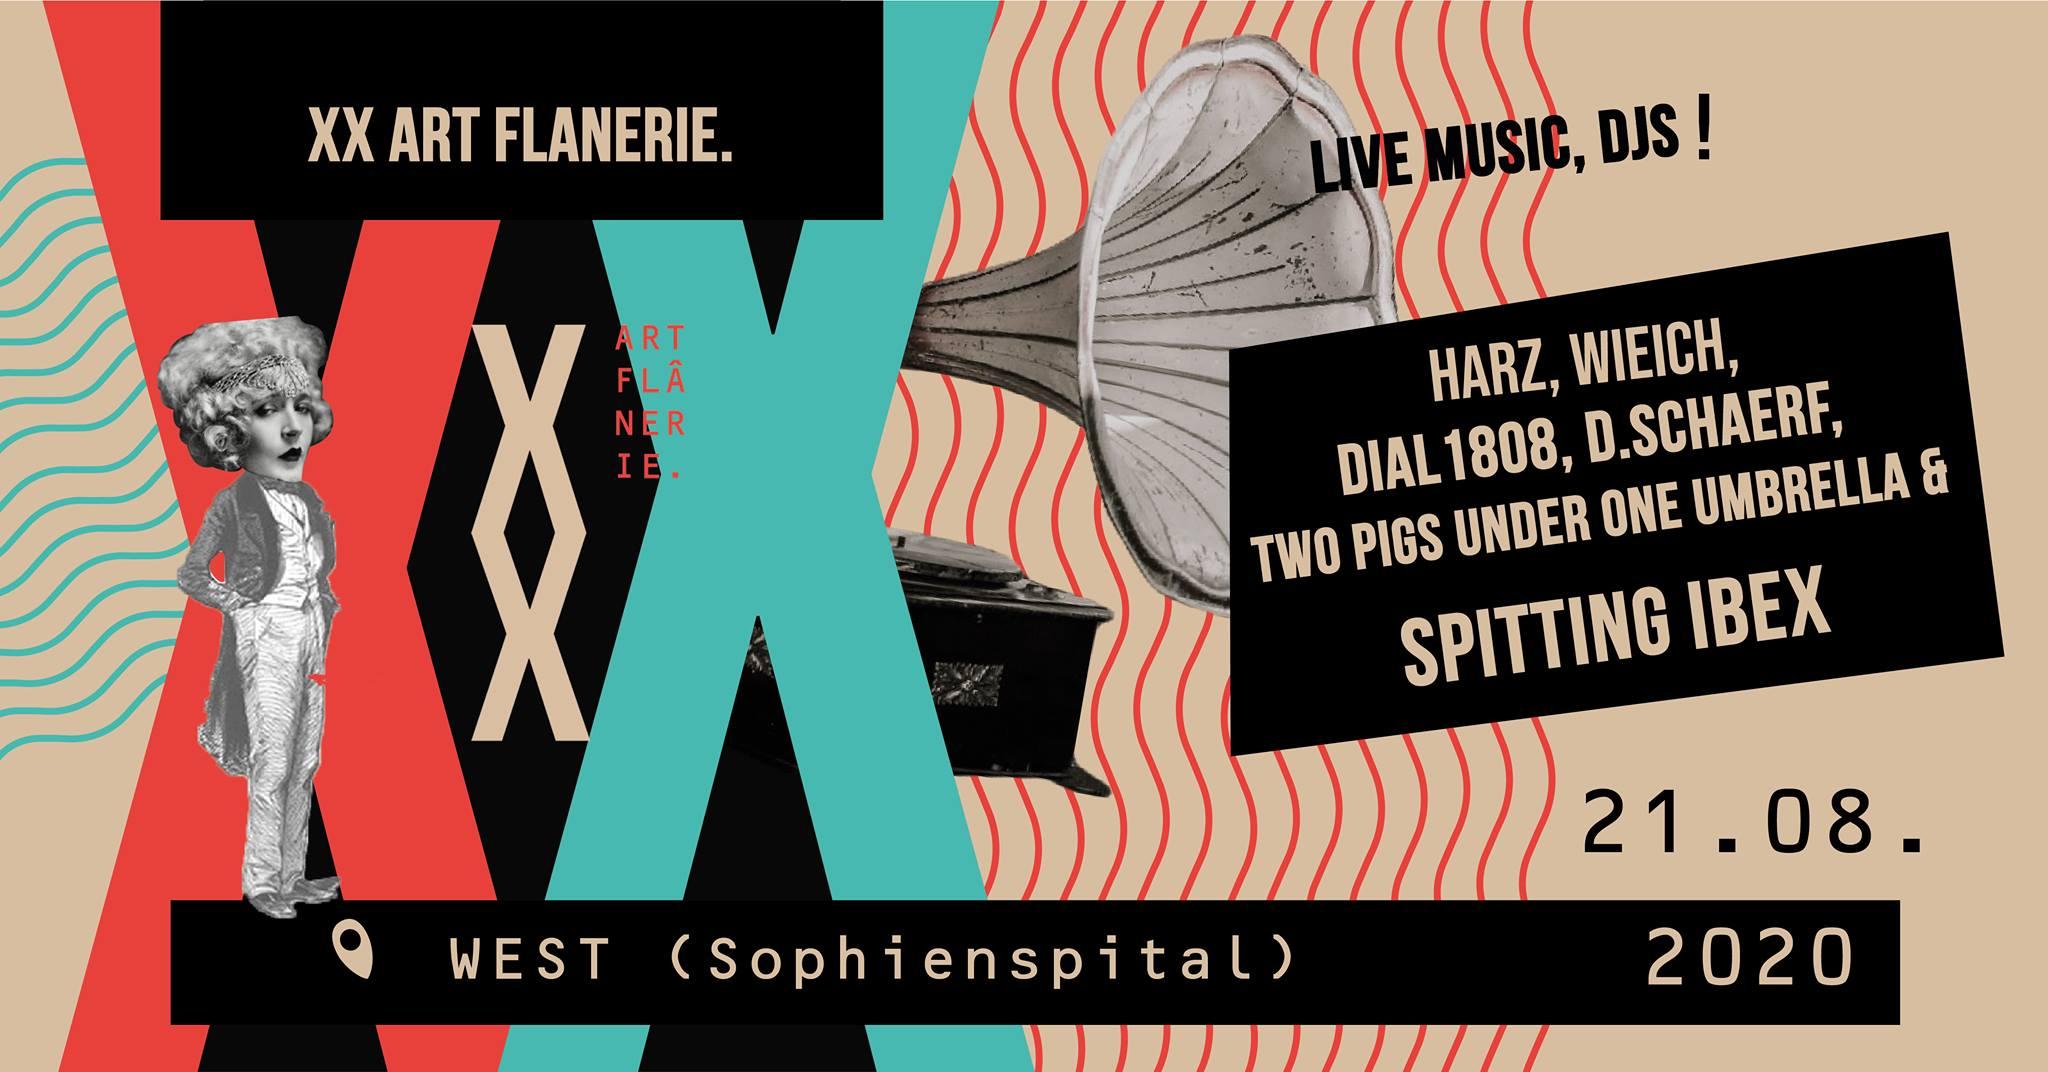 XX Art Flanerie - Music Stage